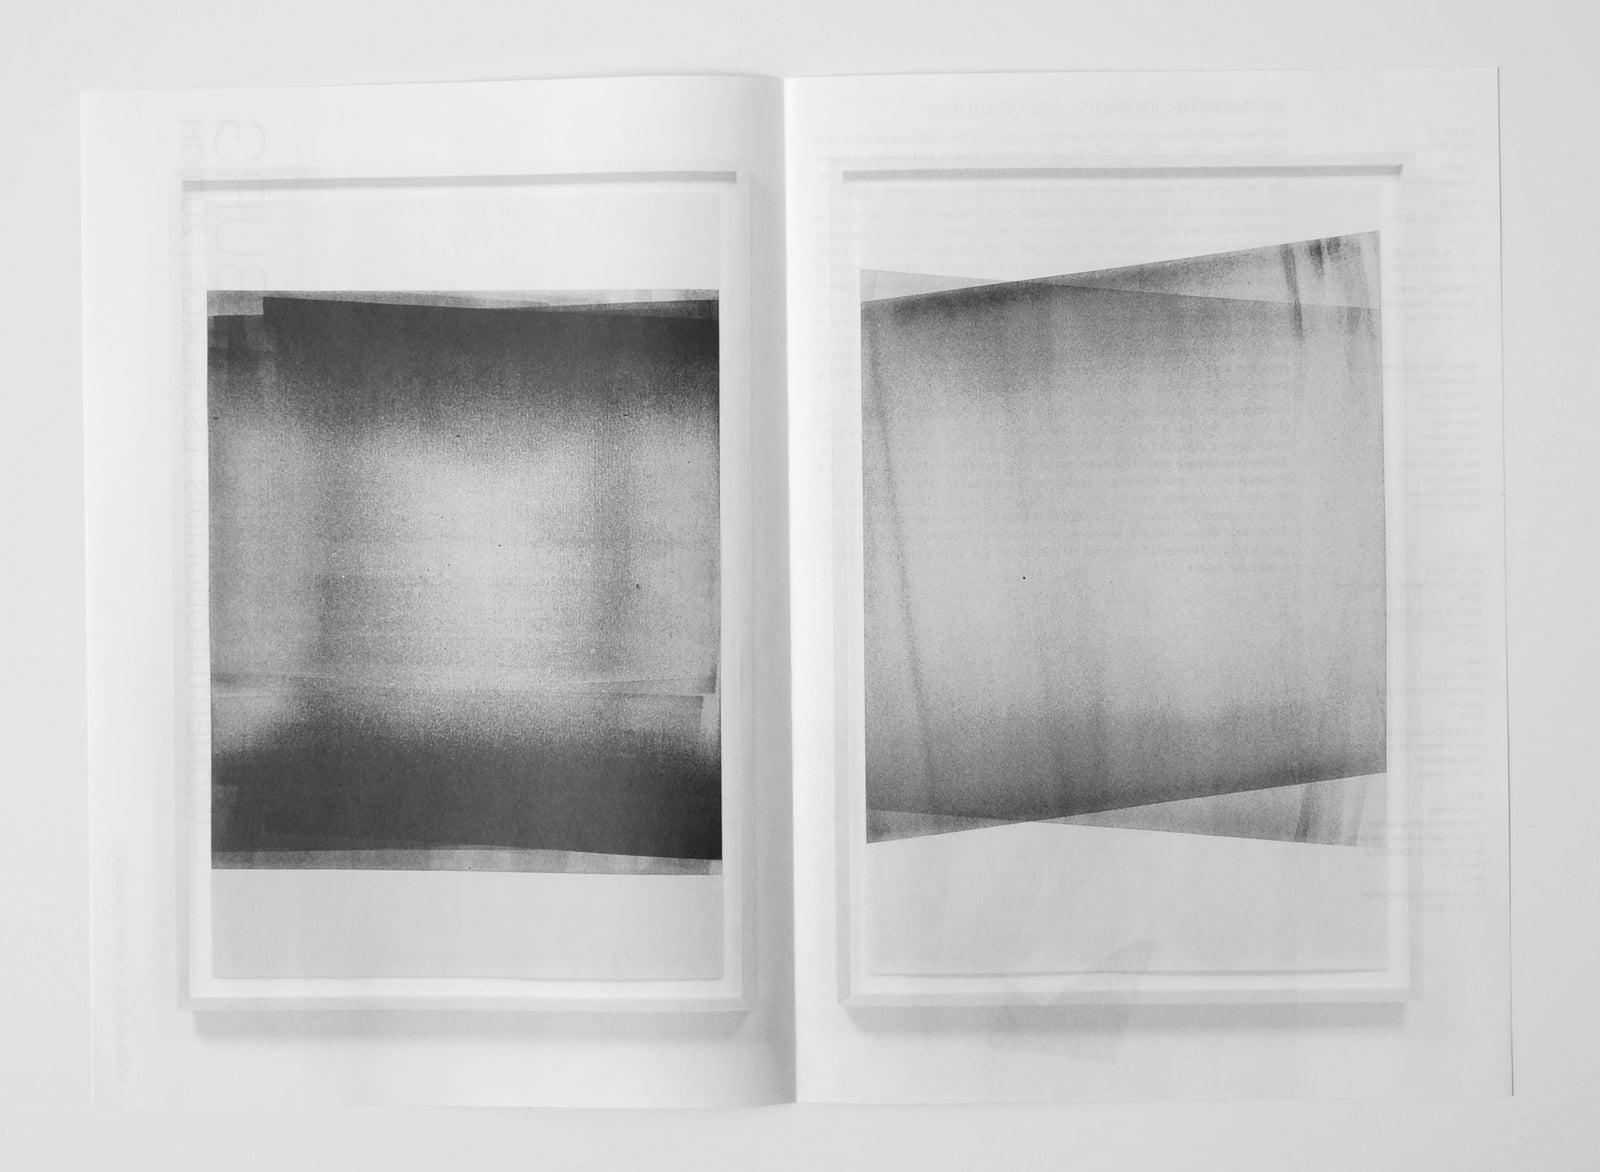 print material,widmertheodoridis (Zurich), at VOLTA NY, New York City, 2015